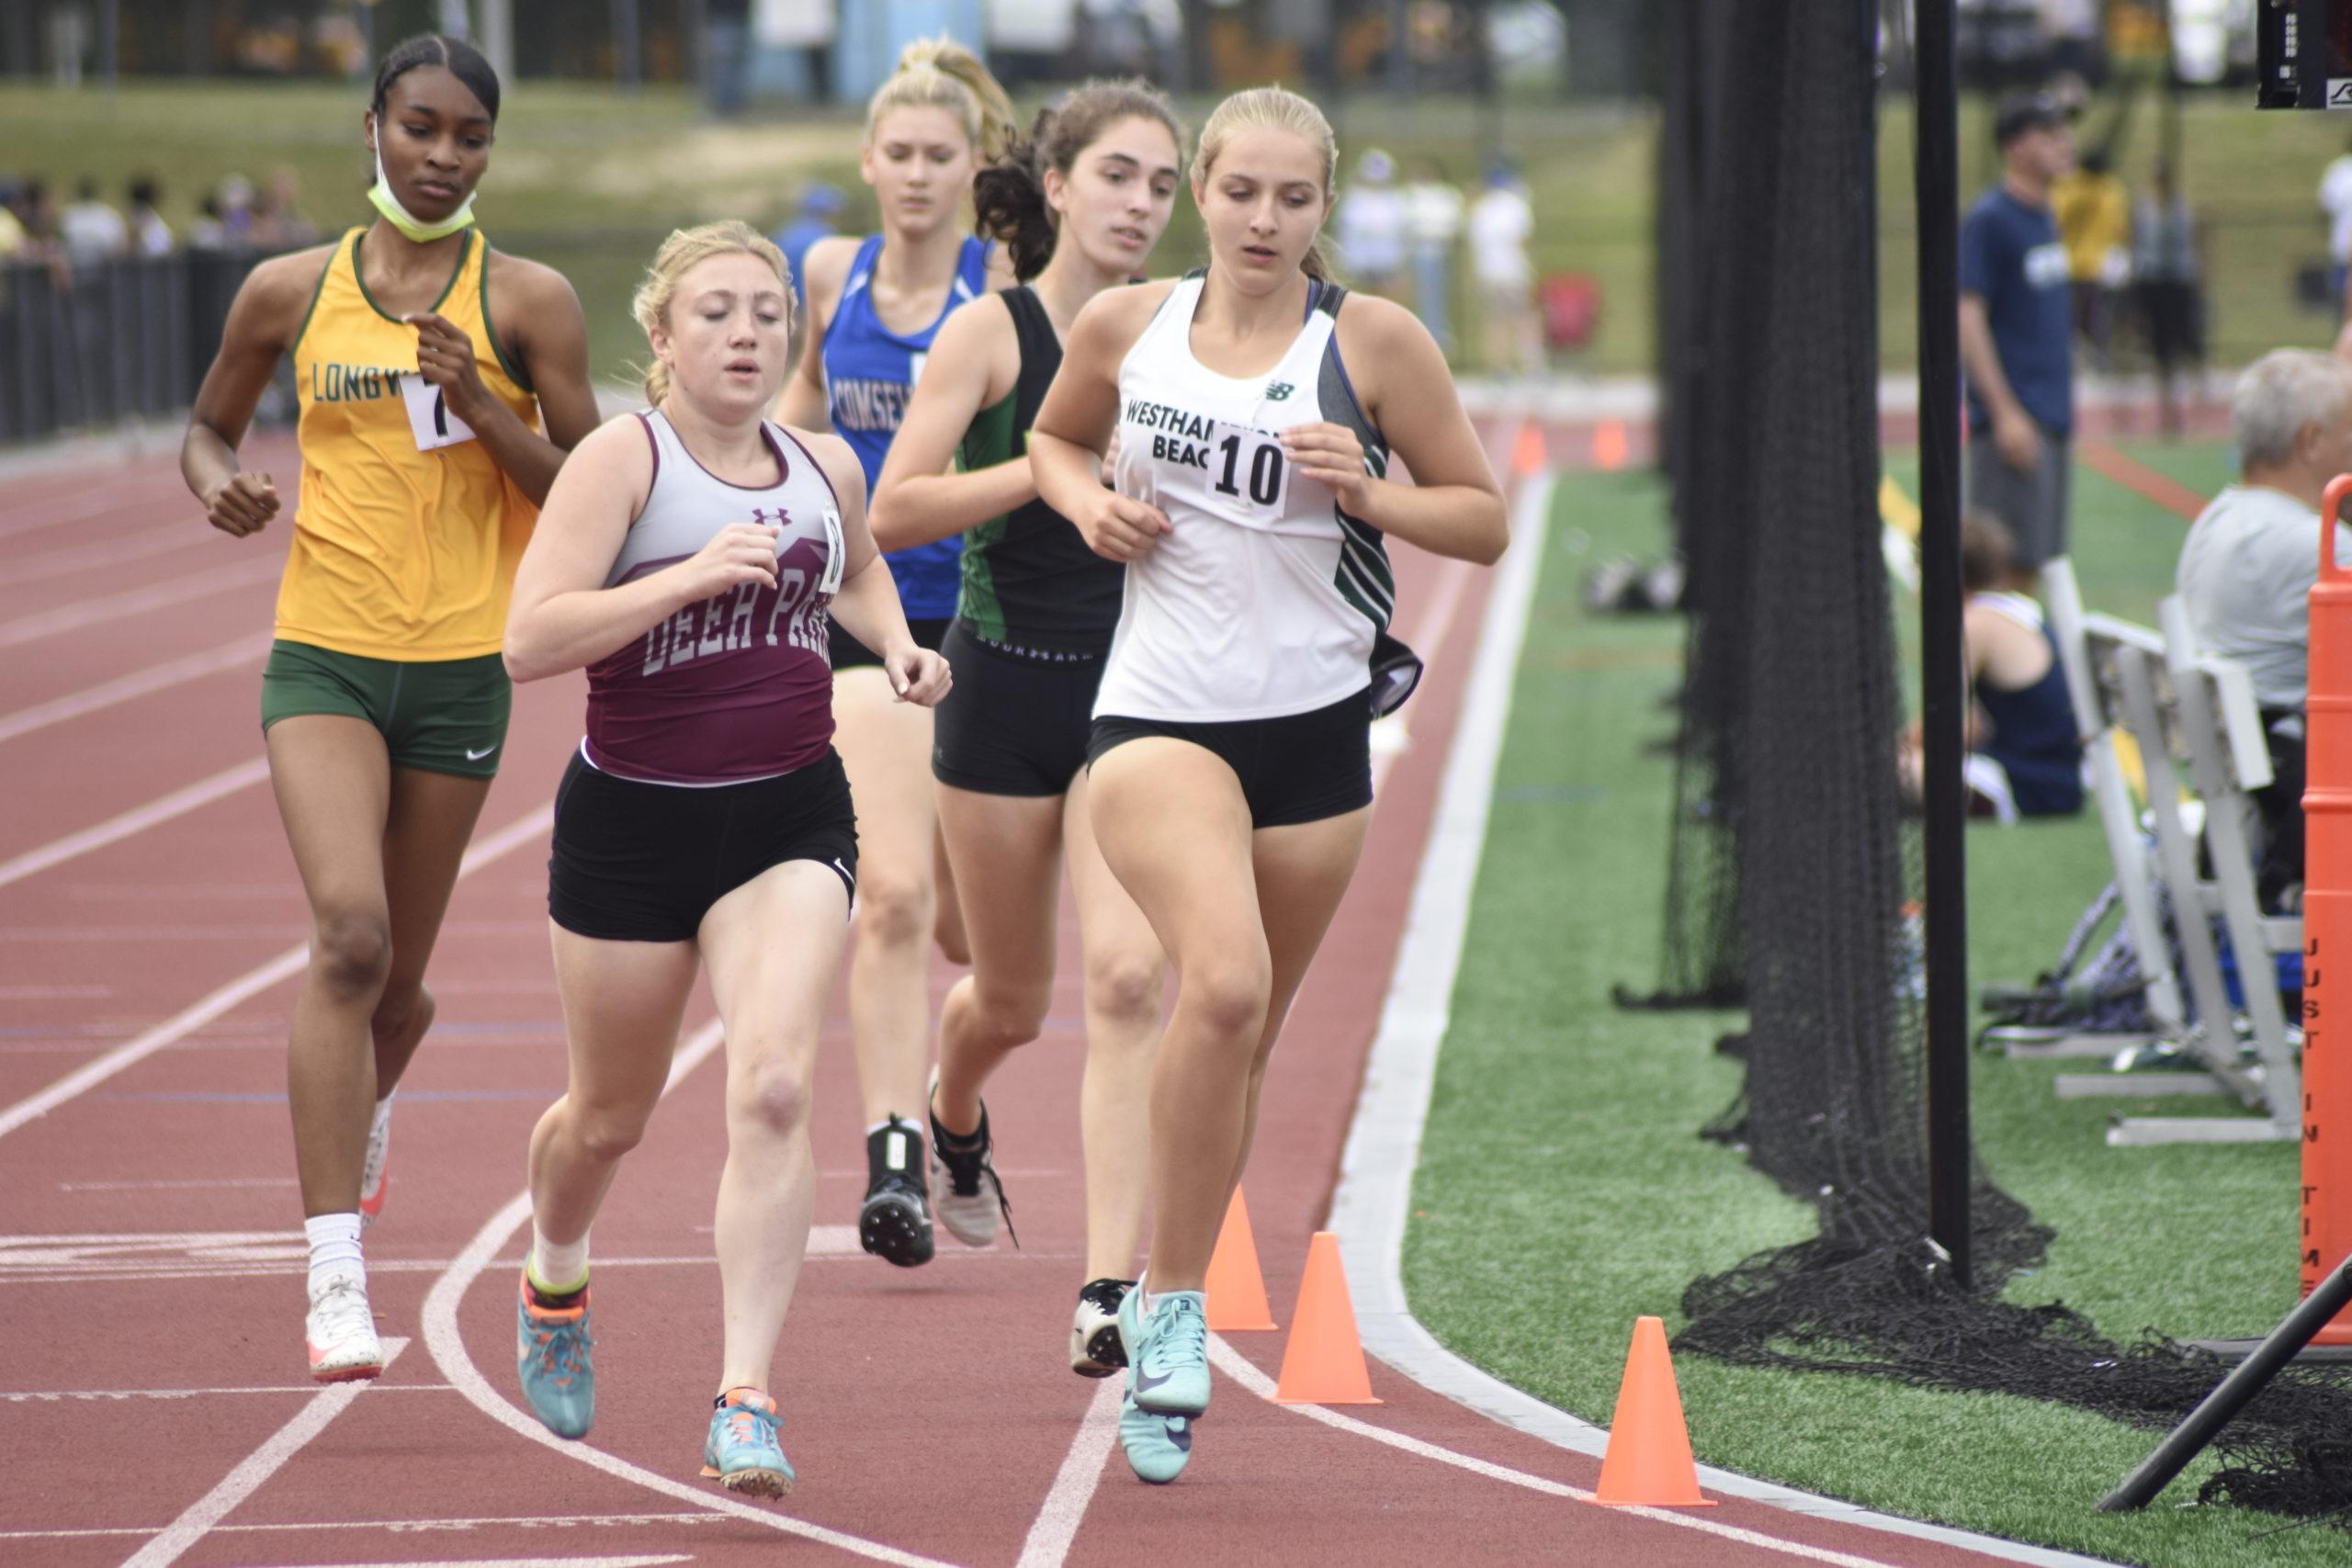 Westhampton Beach freshman Madison Phillips in the 800-meter run portion of the pentathlon.